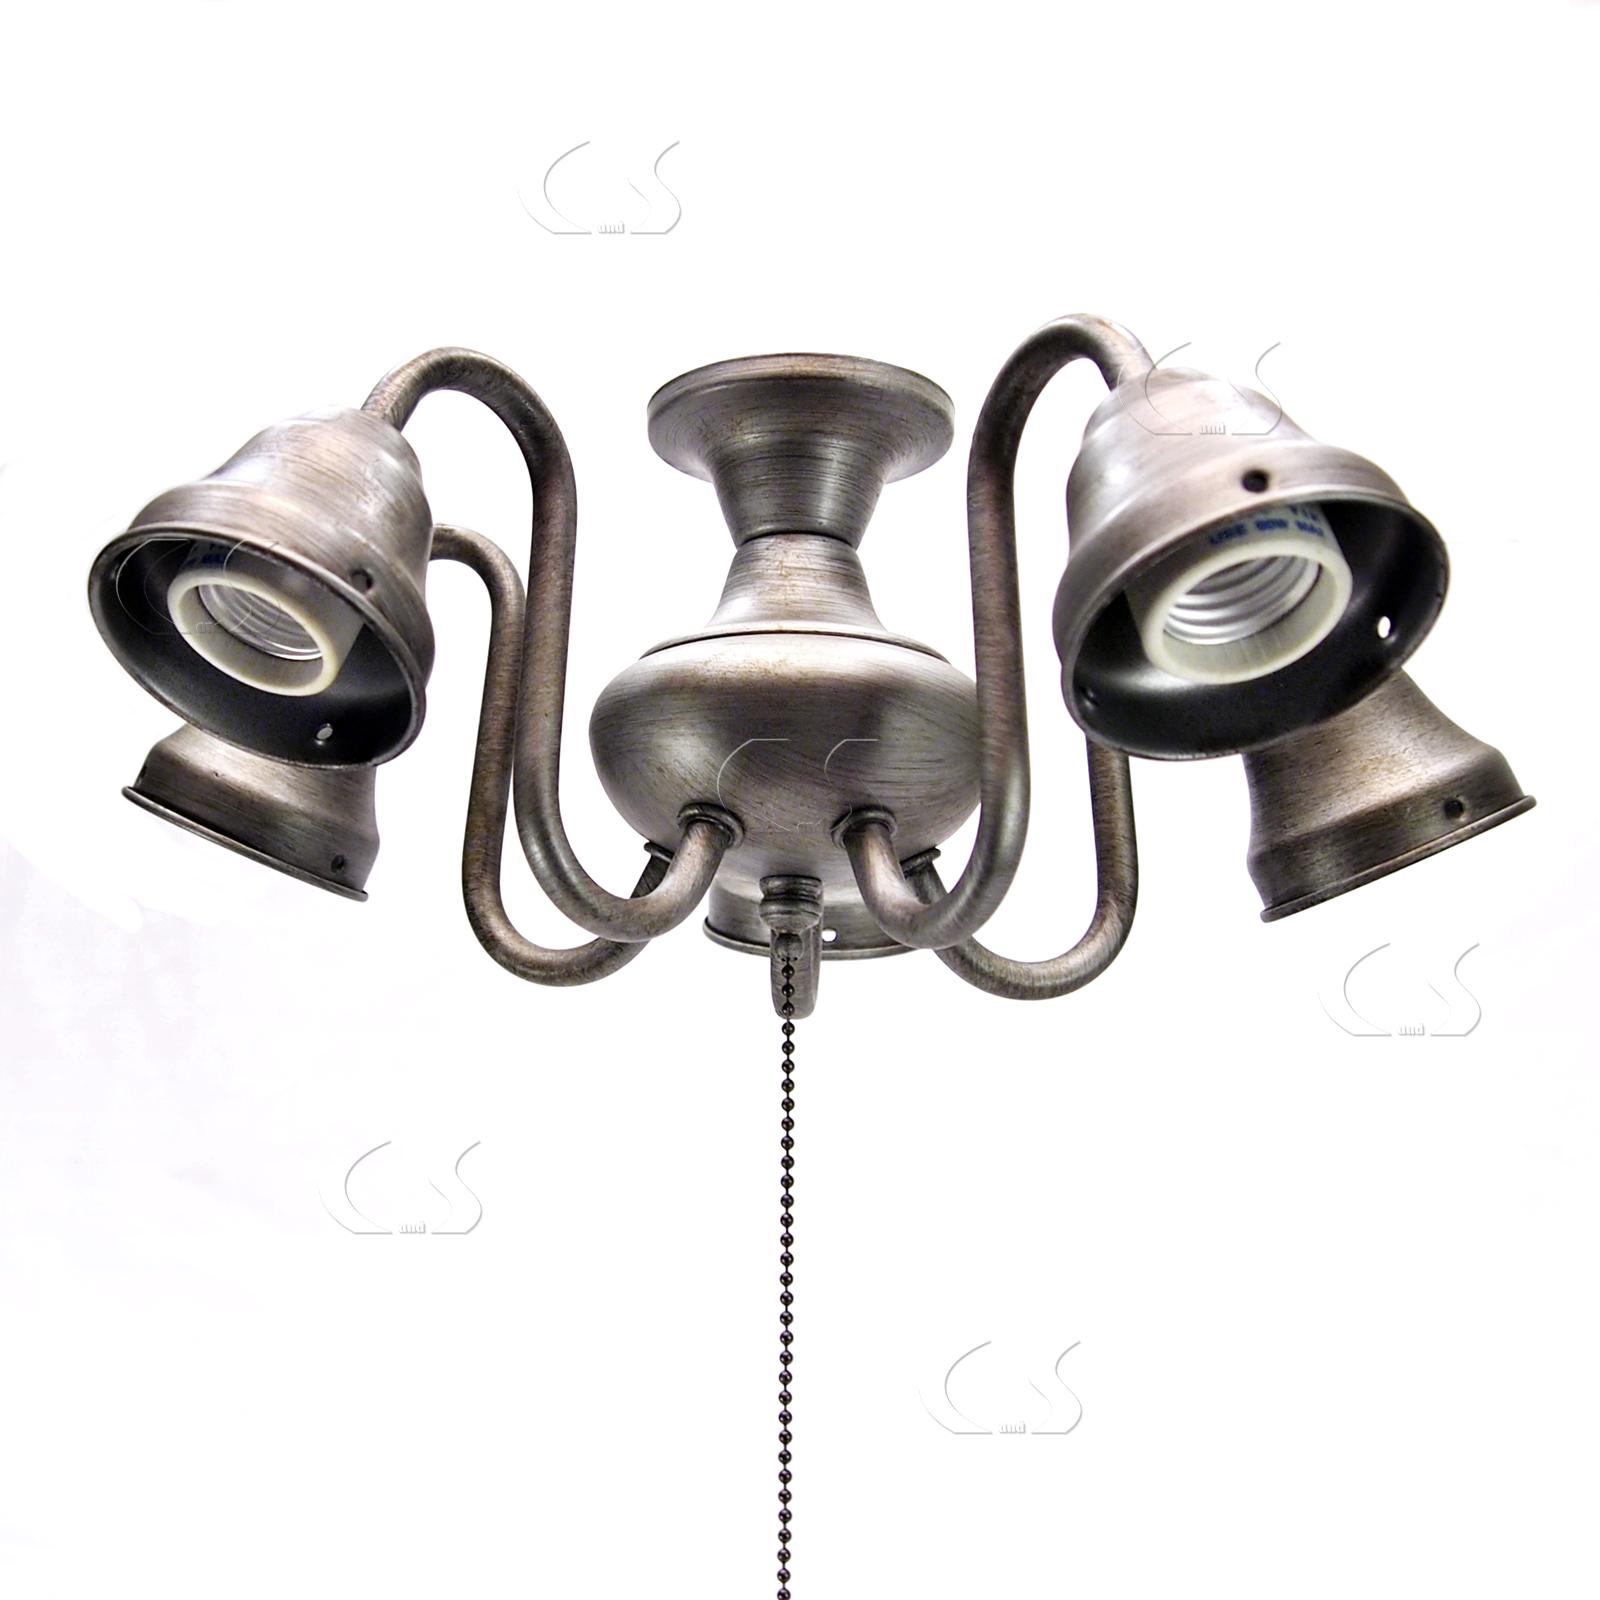 Ceiling Fan 5 Light Chandelier Kit Golden Nickel Quorum 2530 042 354 02